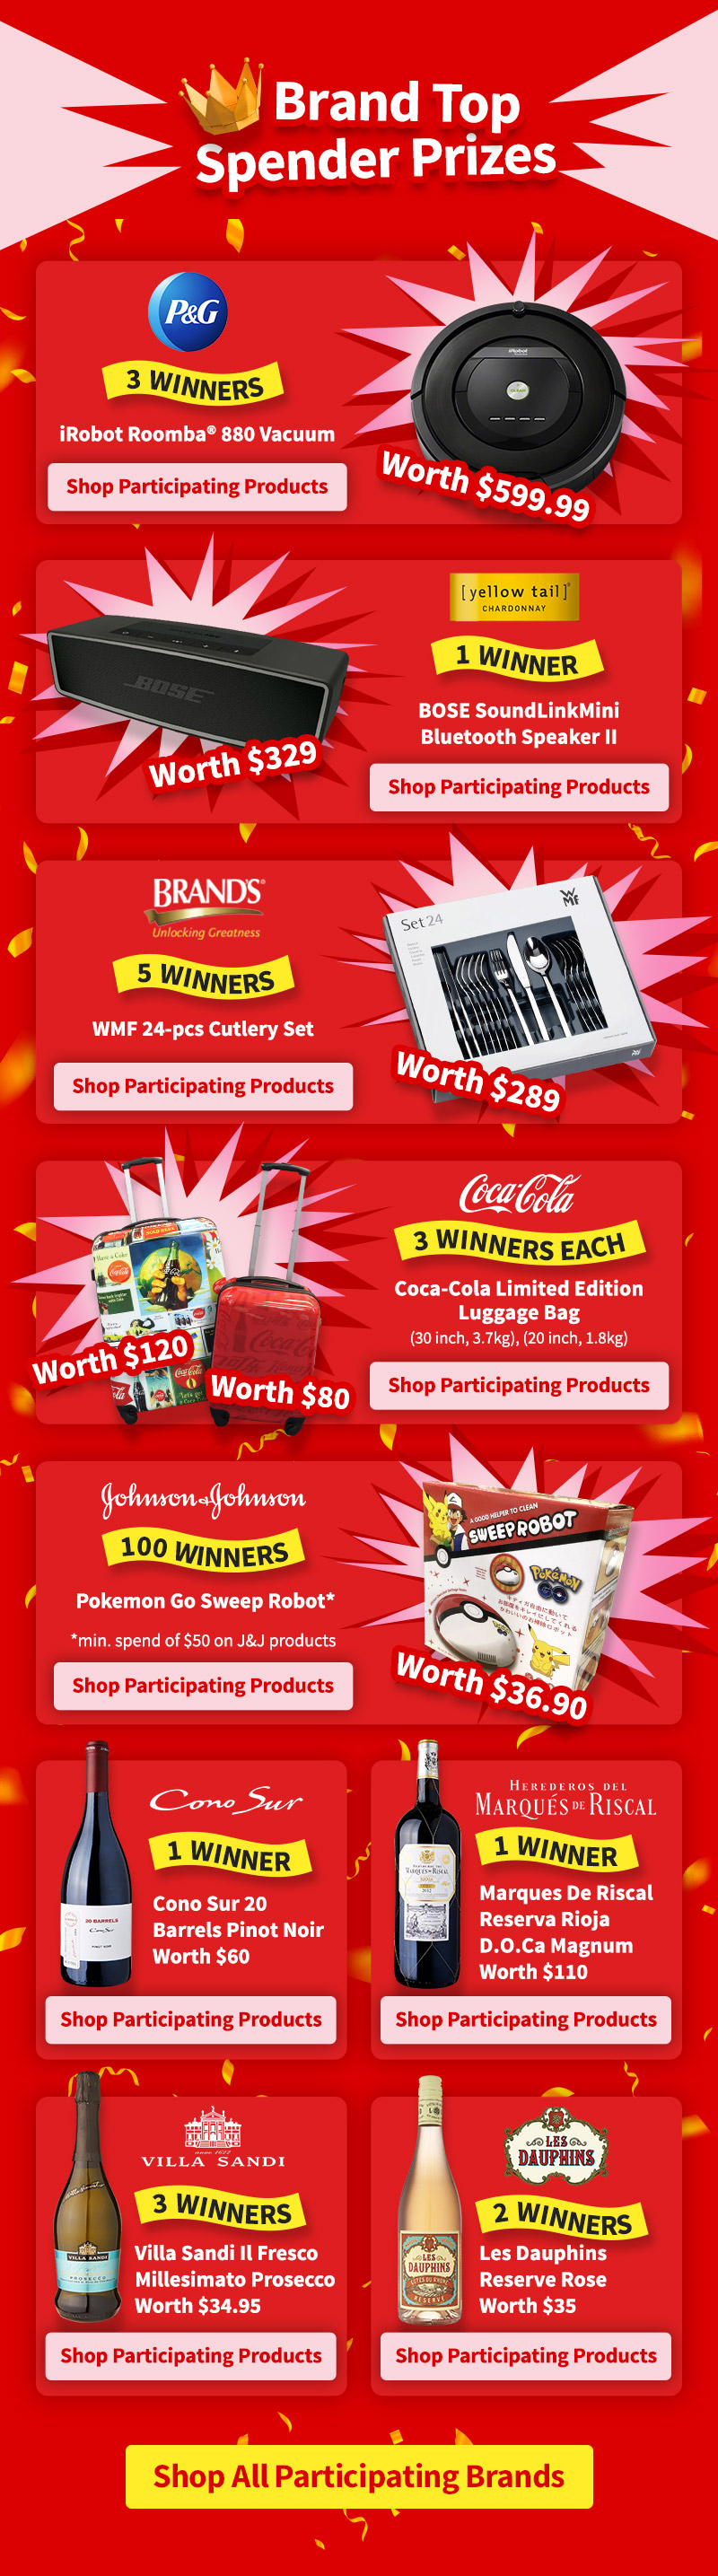 20181003-RedMart 7 Anniversary kickoff Sale-SS-prizes.jpg